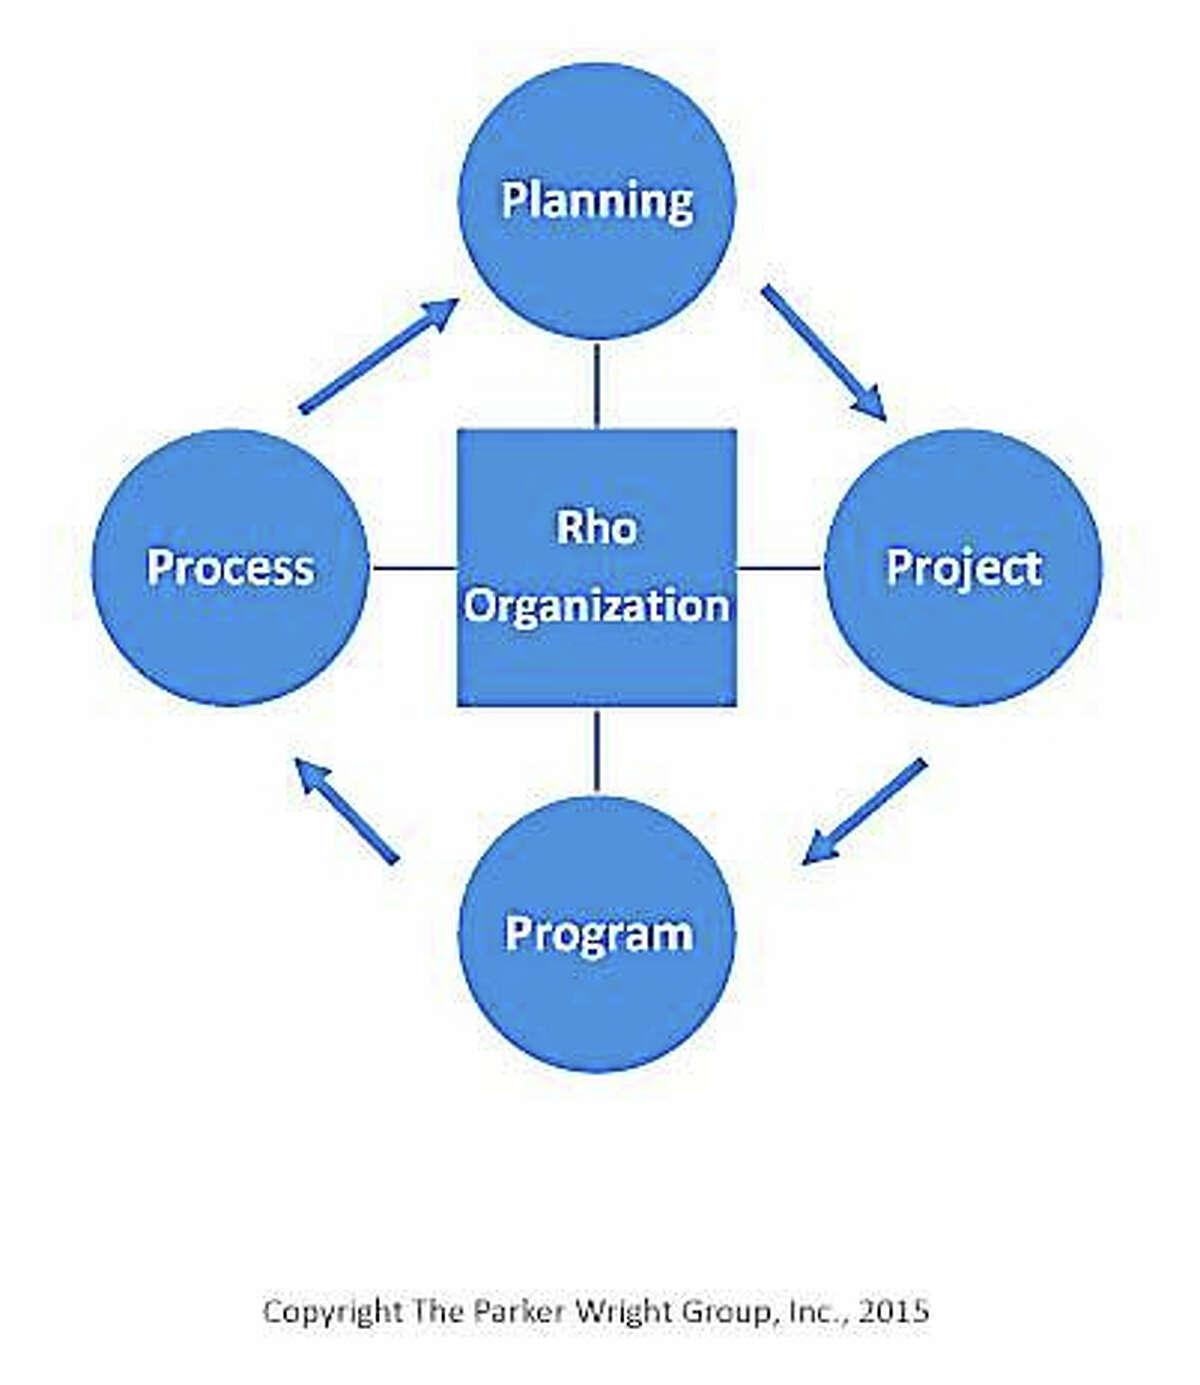 The P (Rho) Organization